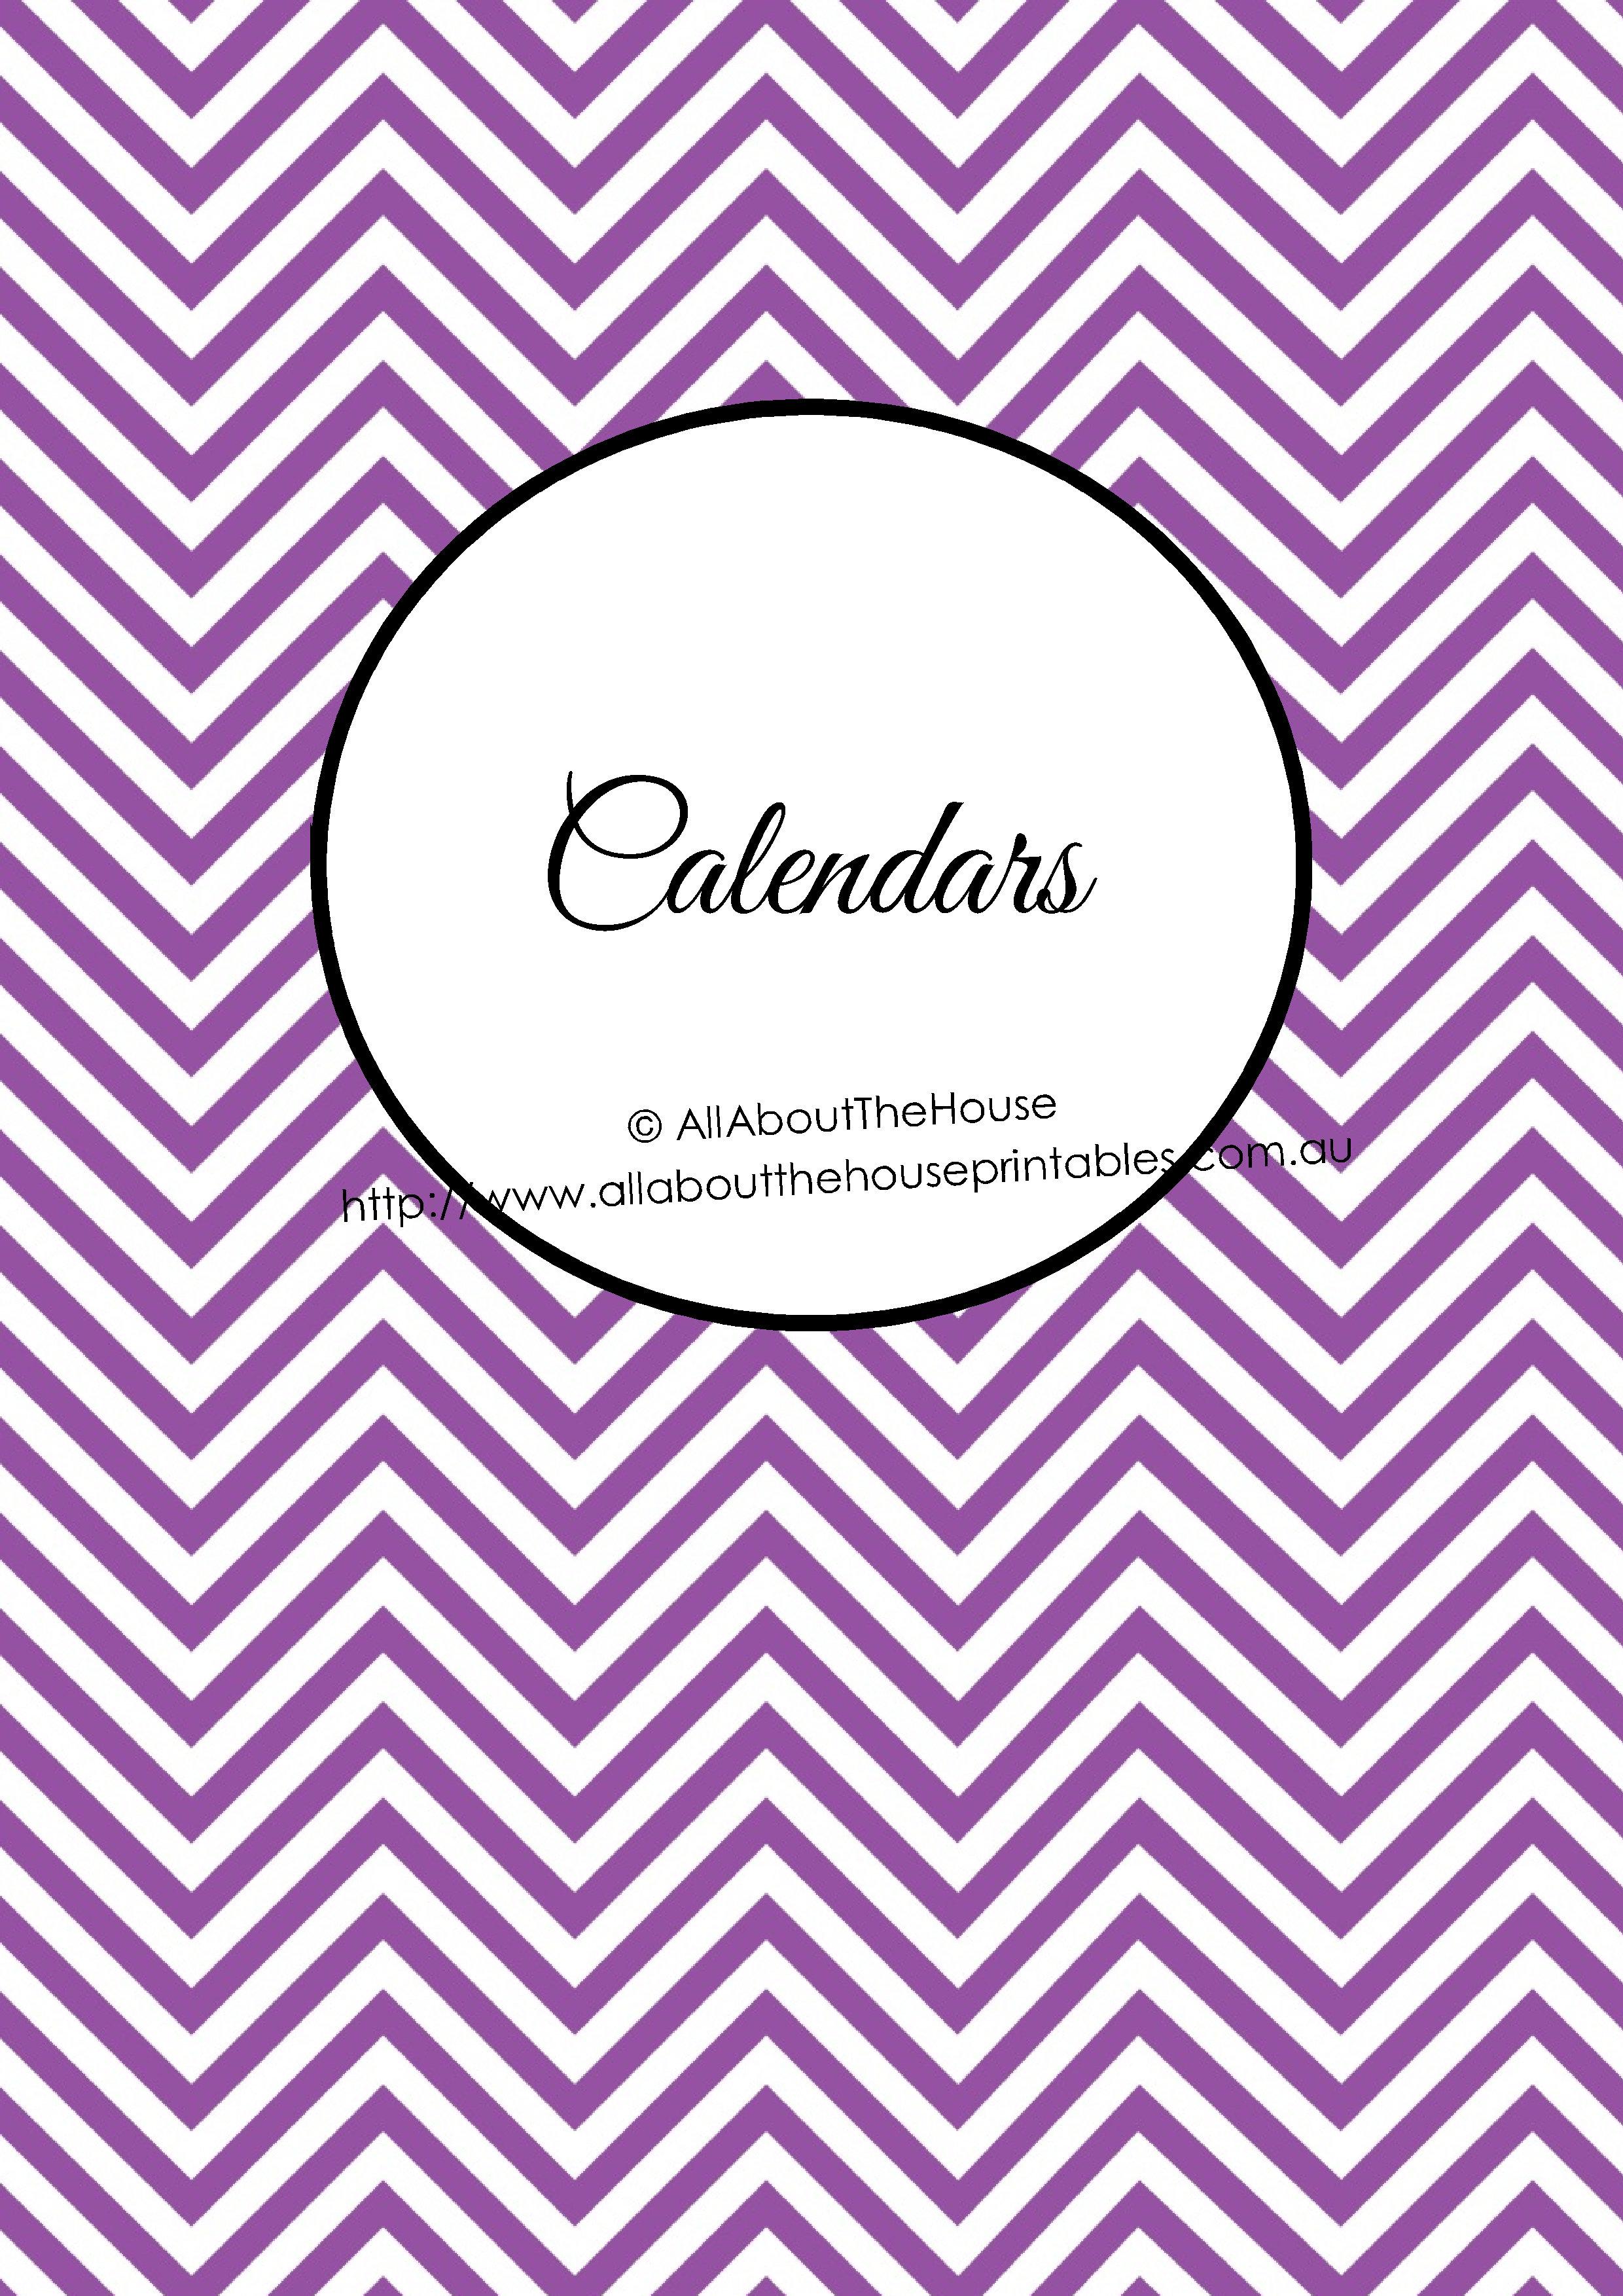 Calendars binder cover chevron printable planner